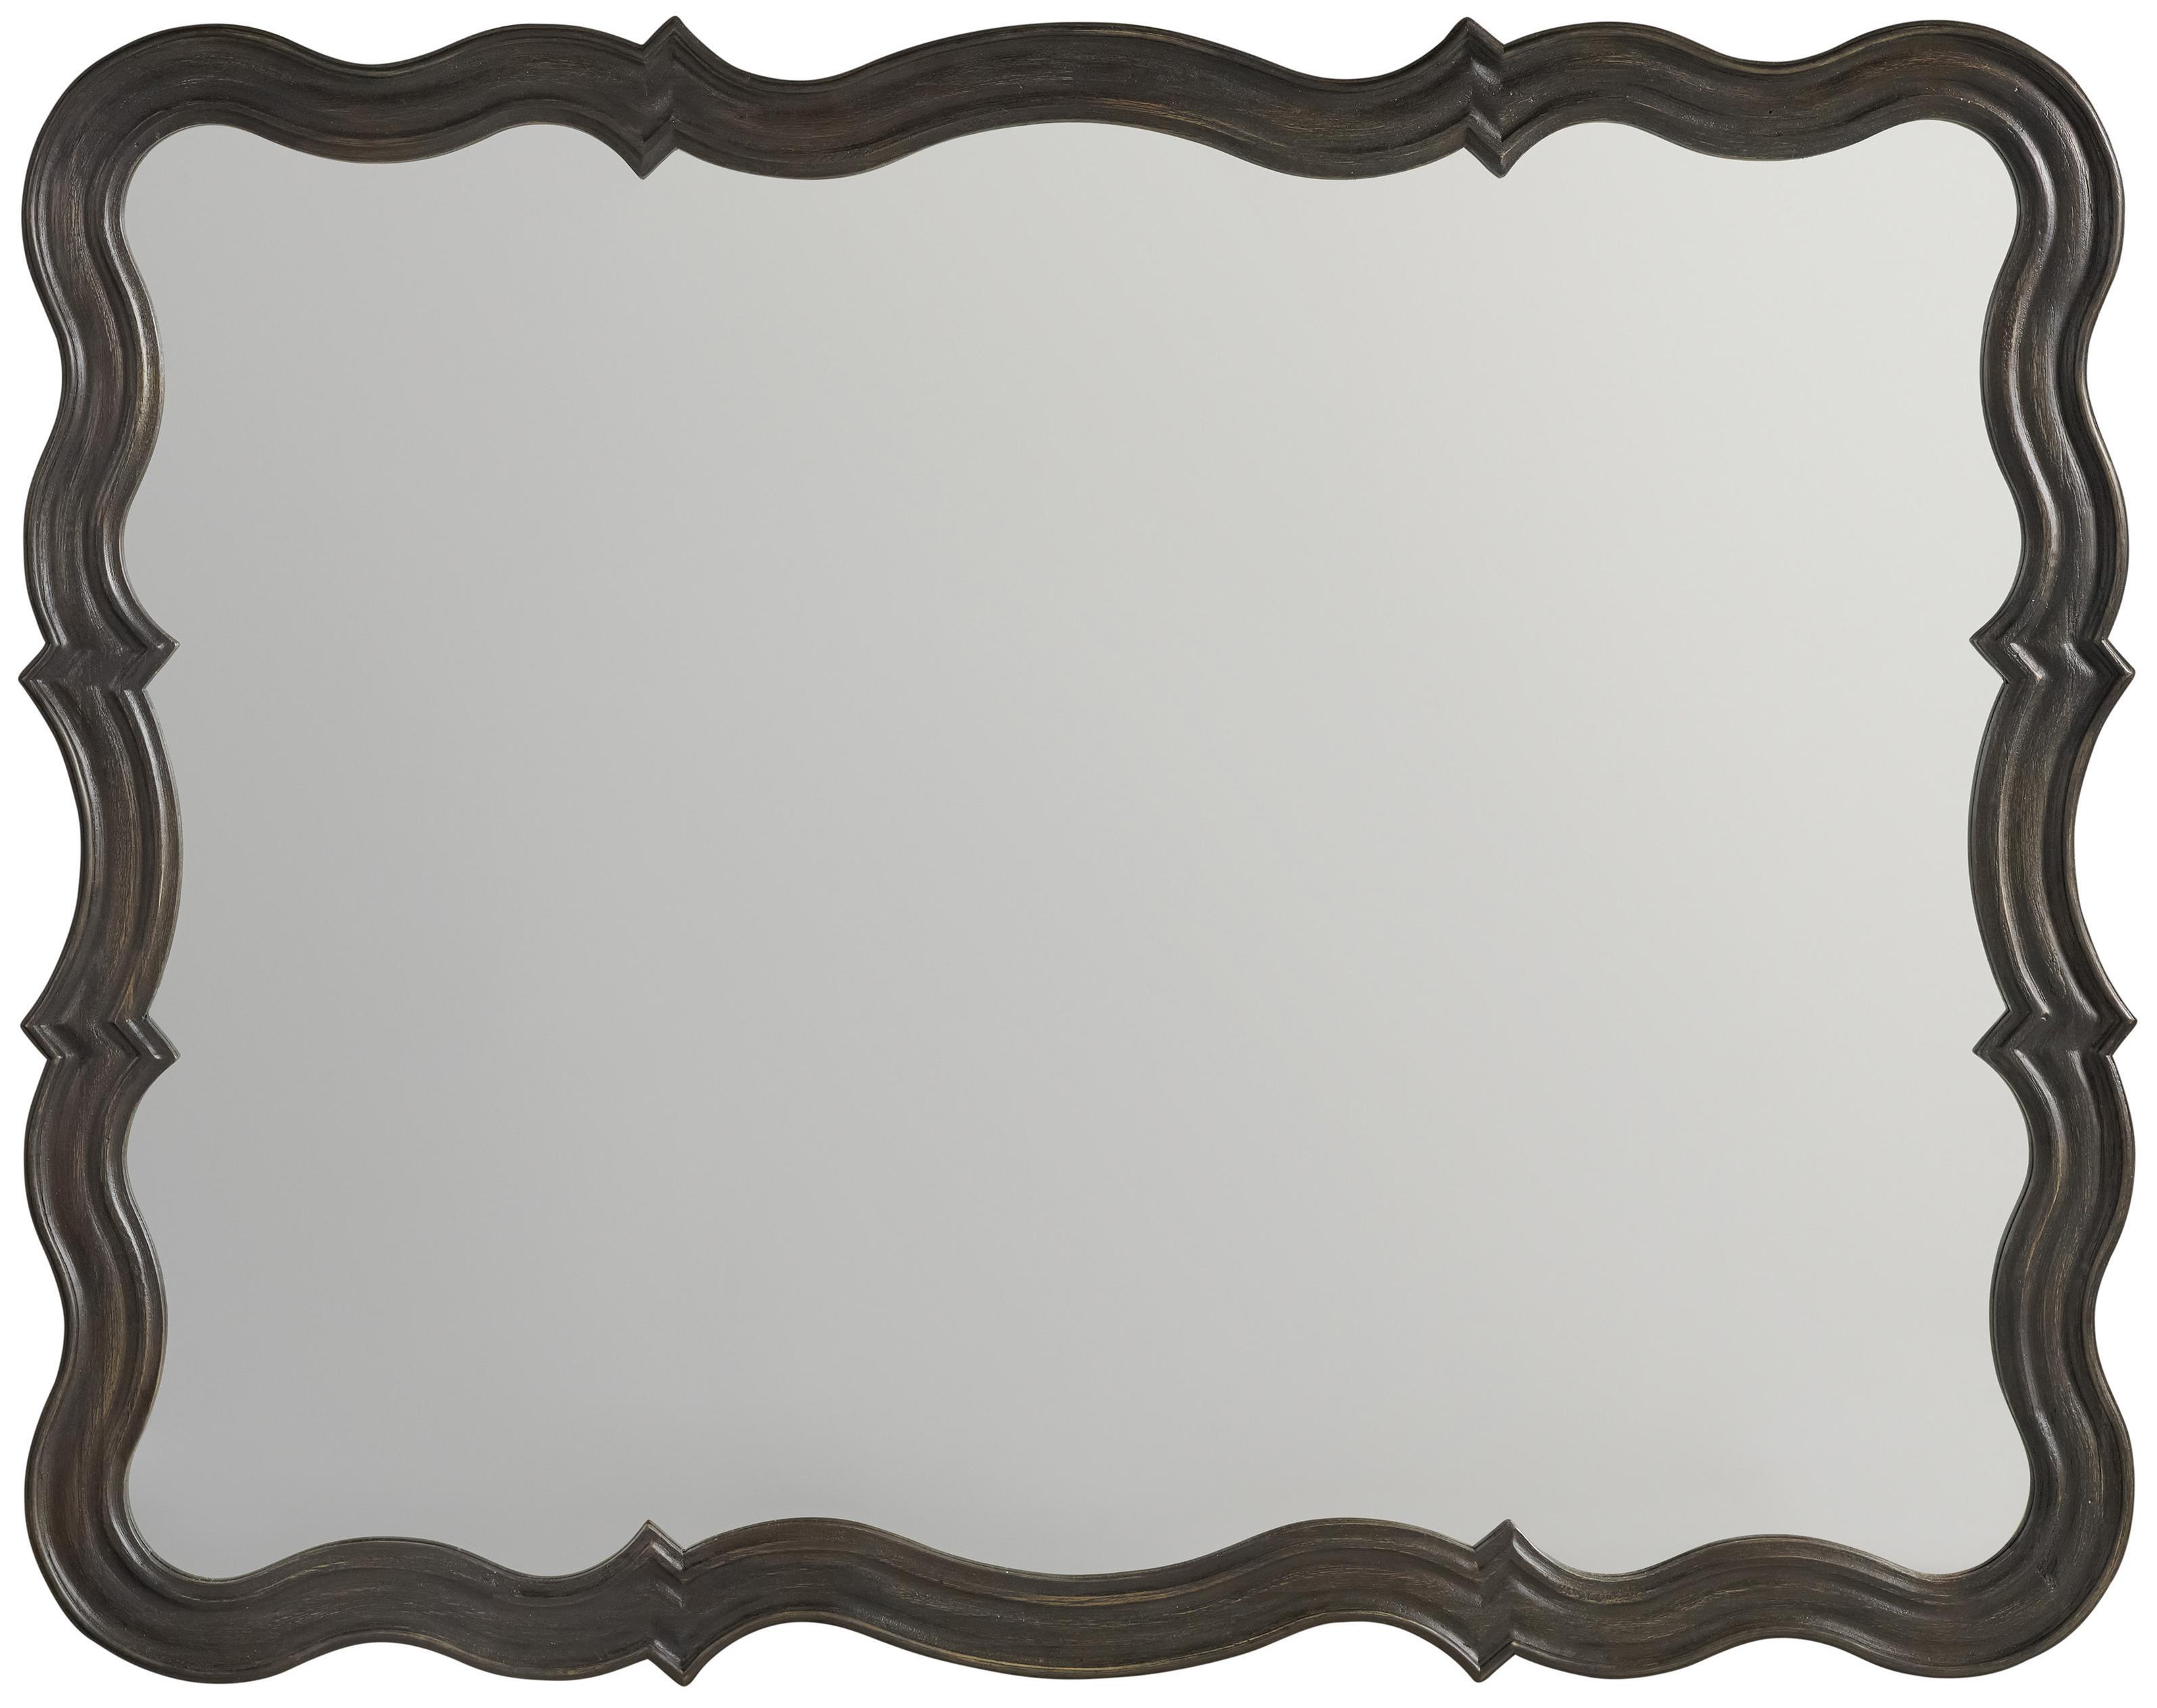 Hooker Furniture Corsica Mirror - Item Number: 5280-90004